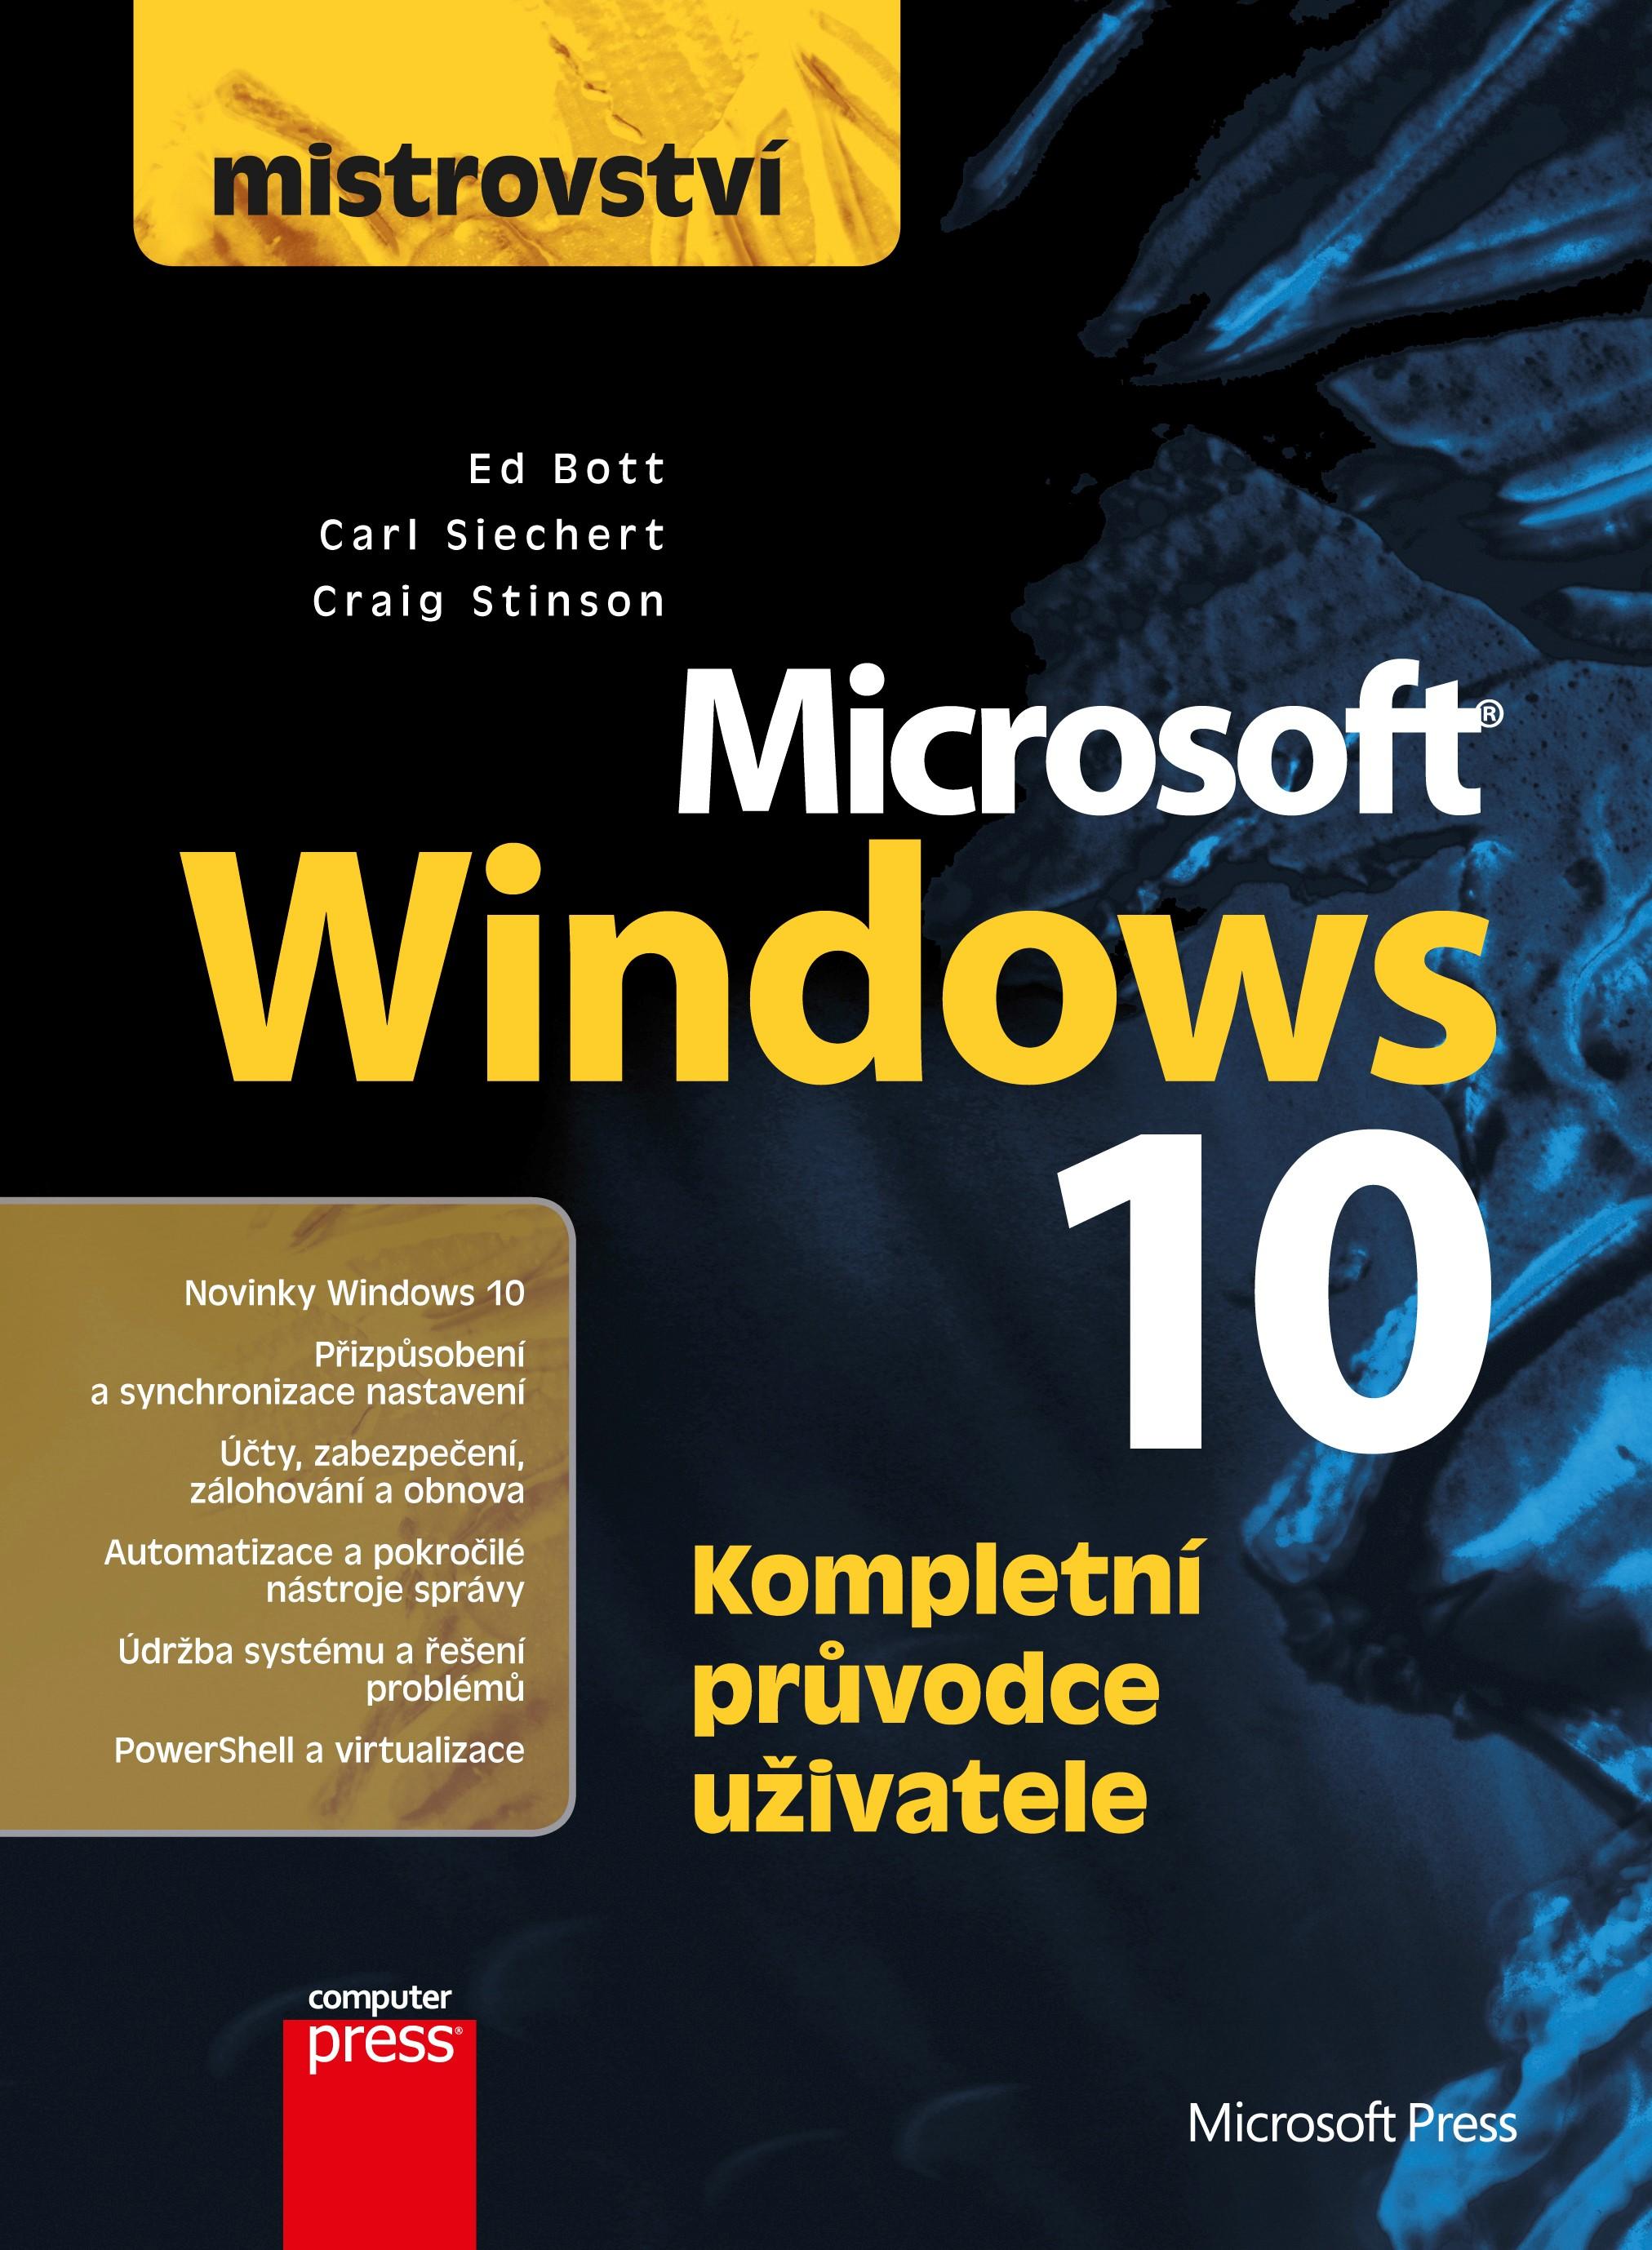 Mistrovství - Microsoft Windows 10 | Craig Stinson, Carl Siechert, Ed Bott